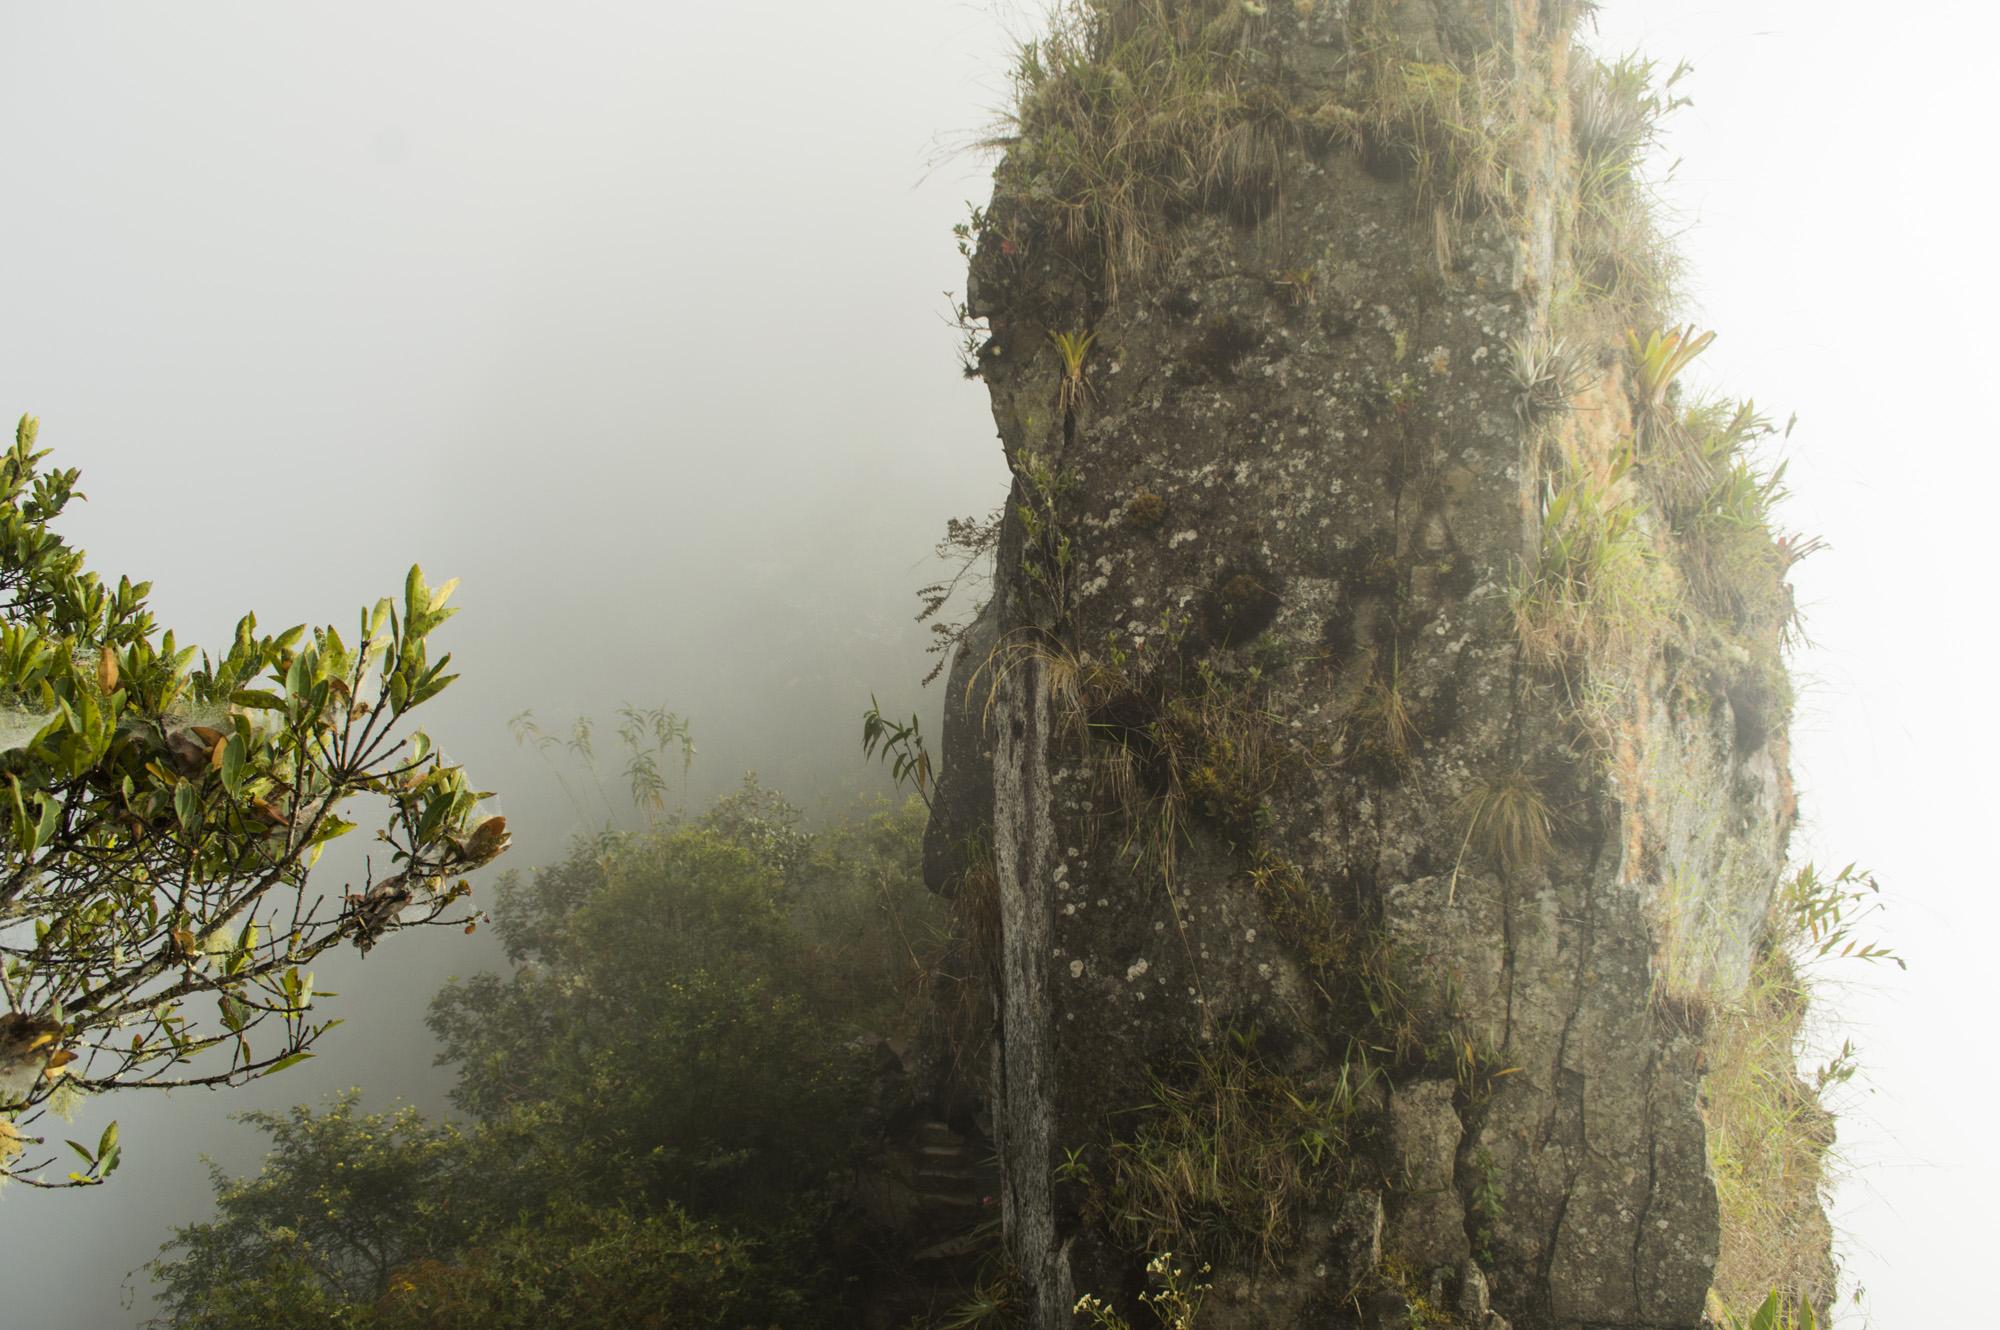 Inca 5 rock near WP fog.jpg